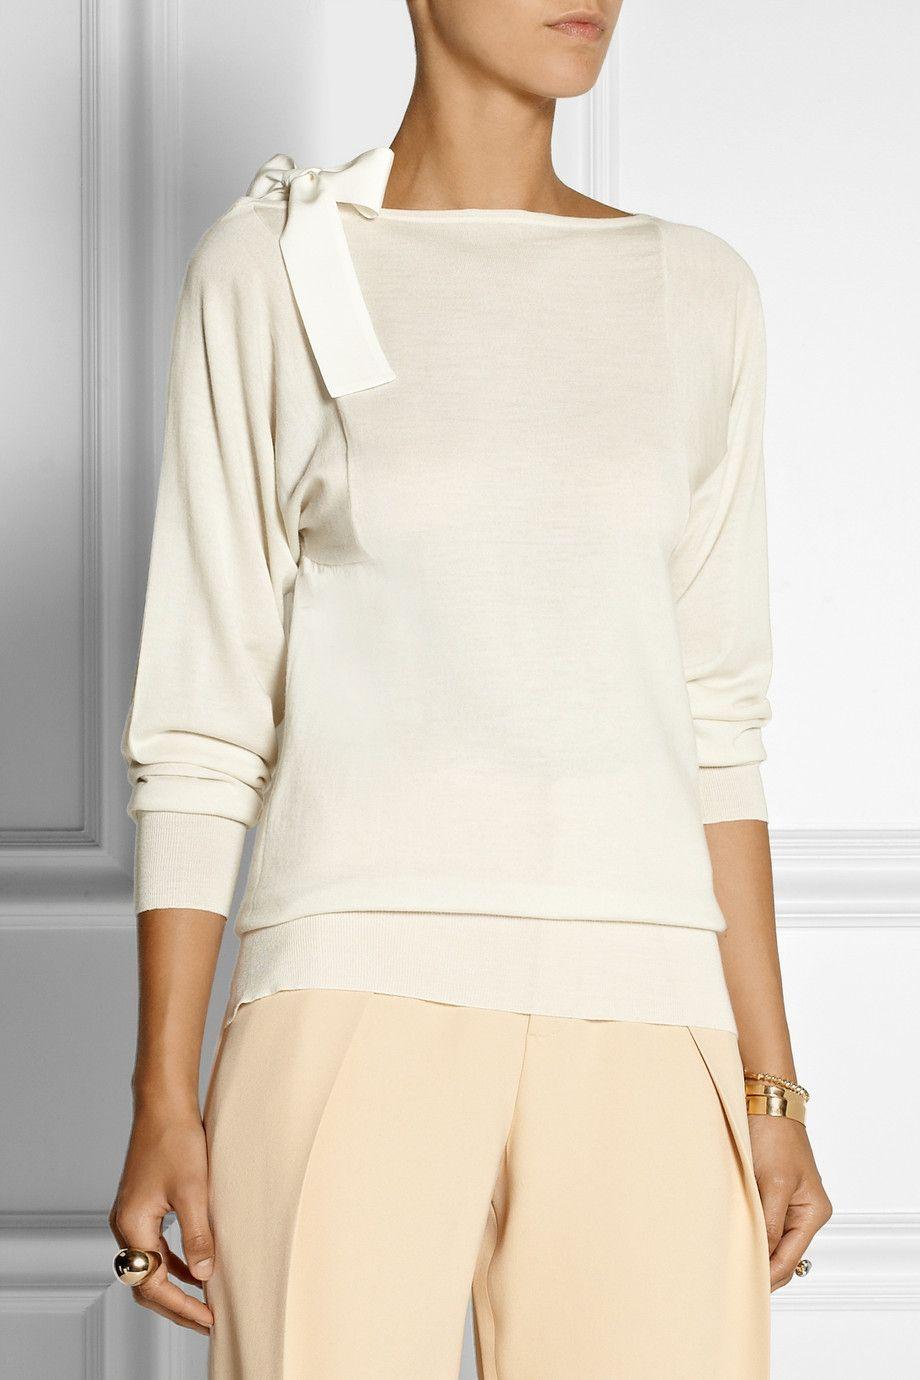 46e2874ca71a85 Vionnet Silk-Trimmed Fine-Knit Merino Wool Sweater in White | Lyst ...